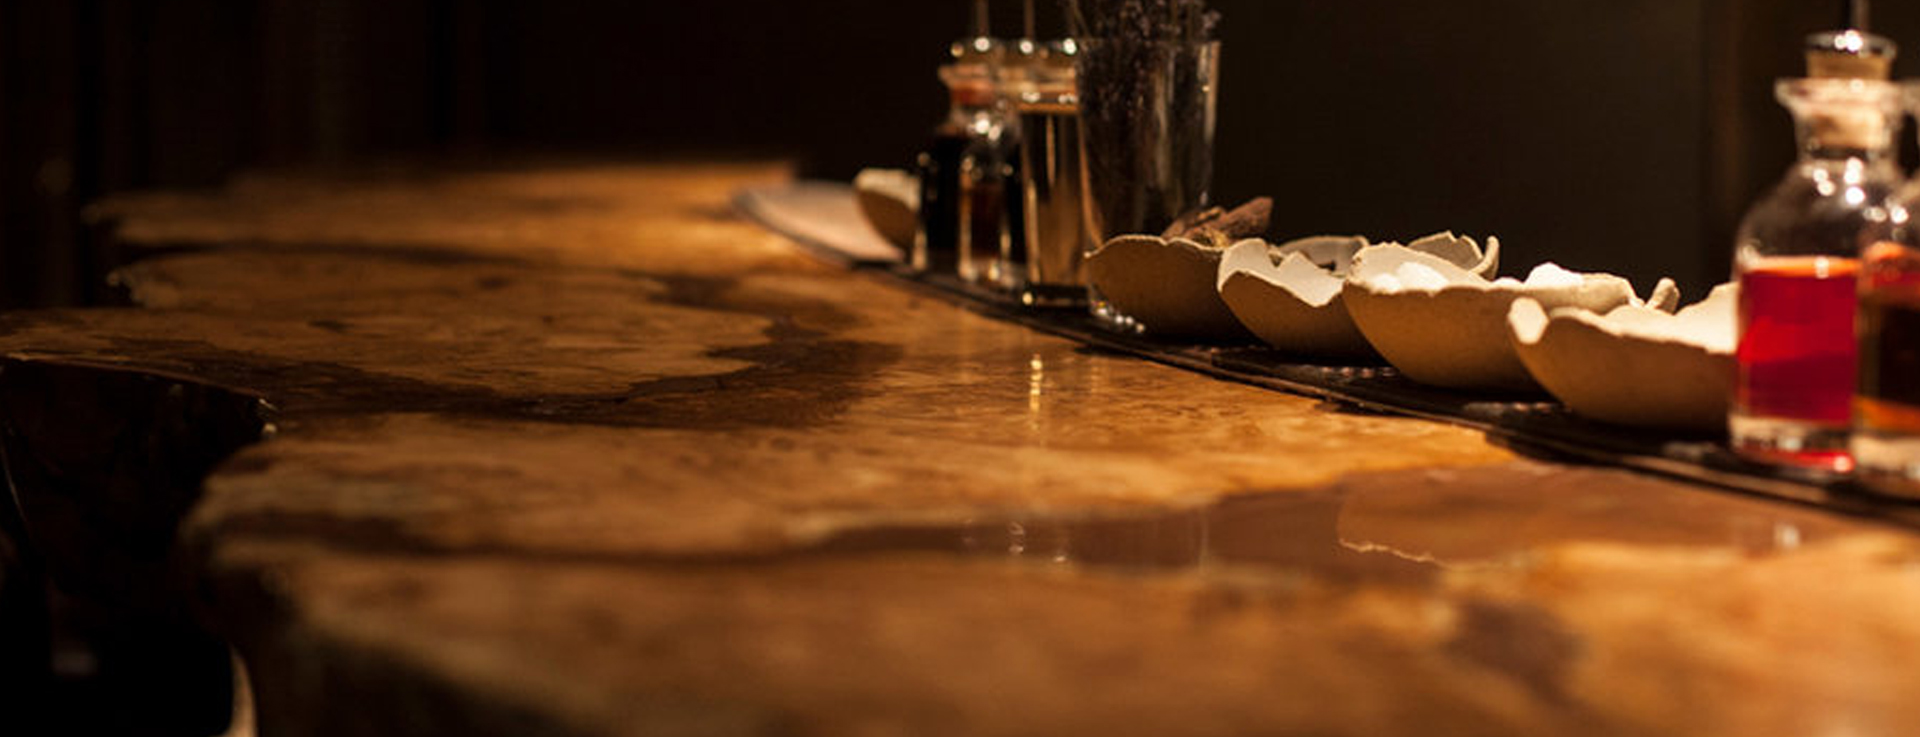 Hide-Restaurant-Interior-bar-Top-craignarramore